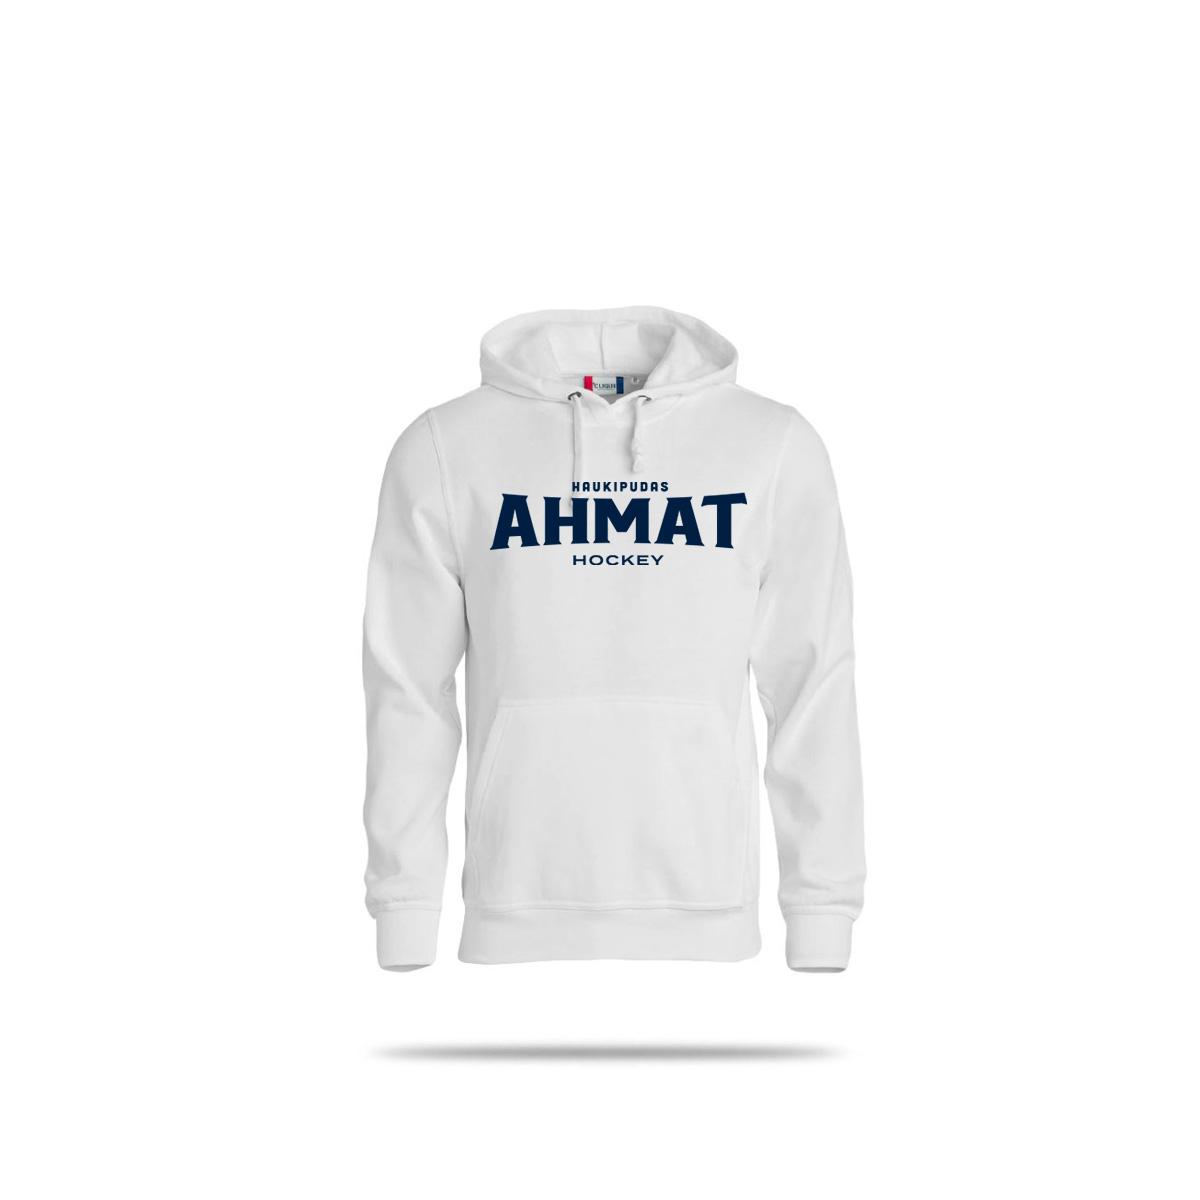 Ahmat-fani-3026-valk-text